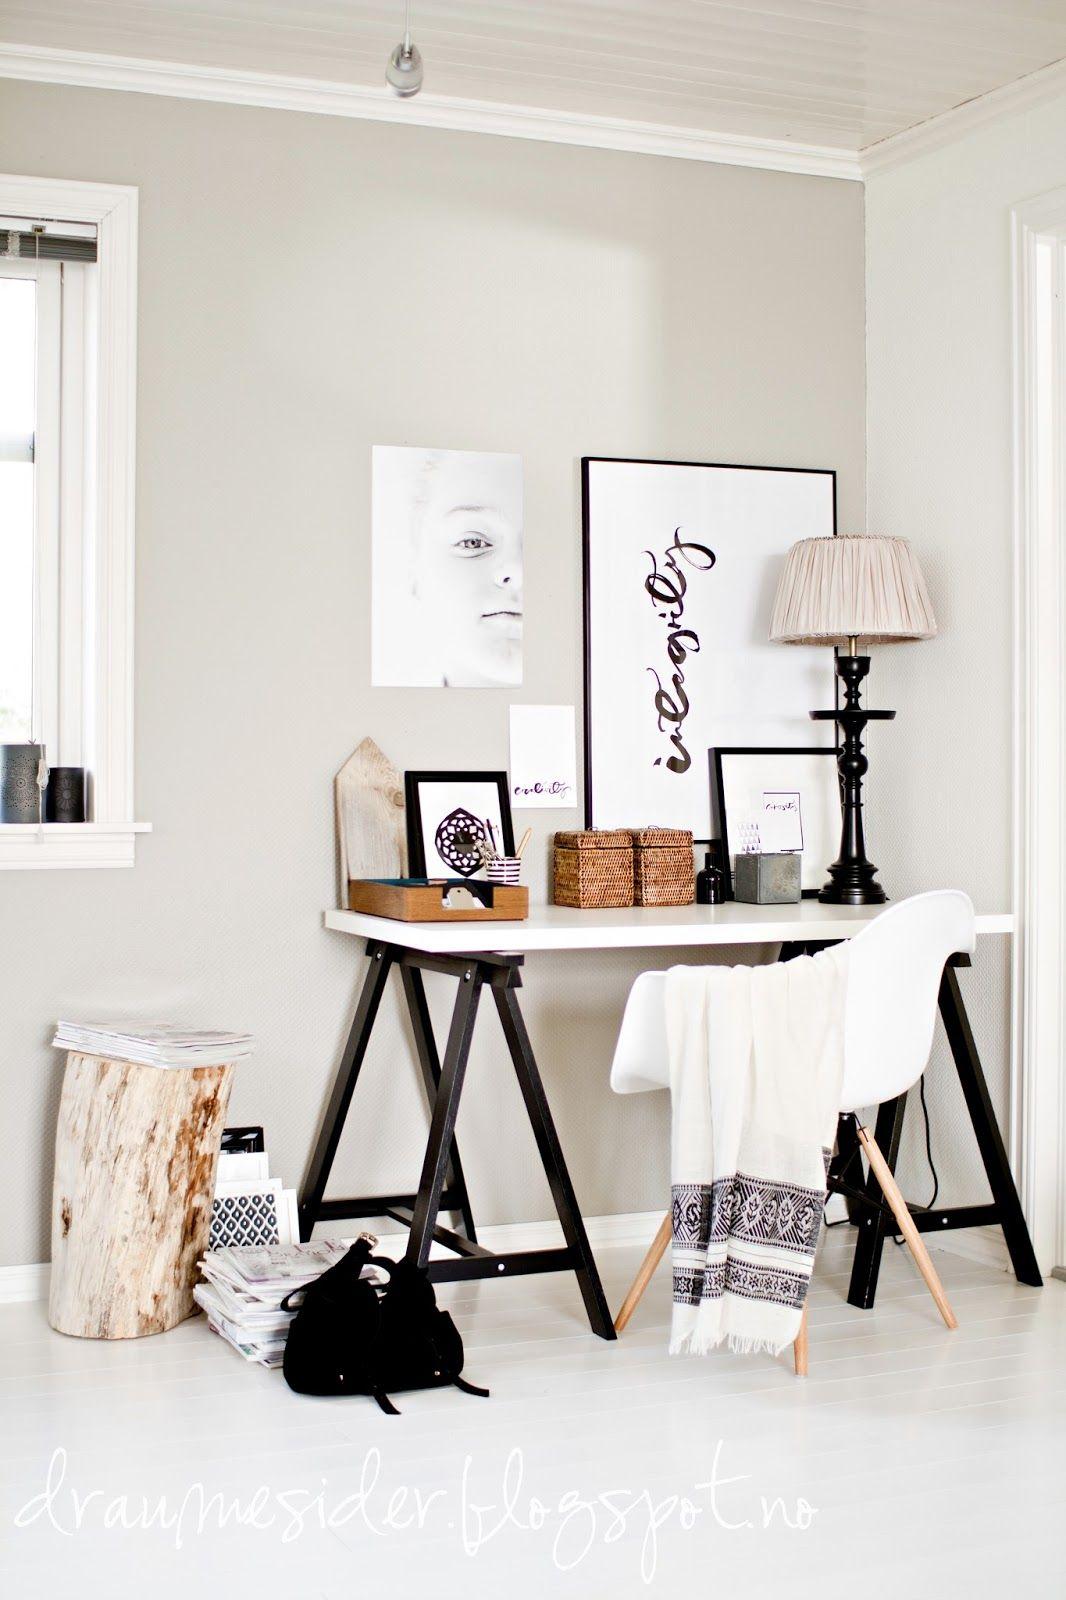 kontor1.jpg (1066×1600) | Office & Studio | Pinterest | Interiors ...